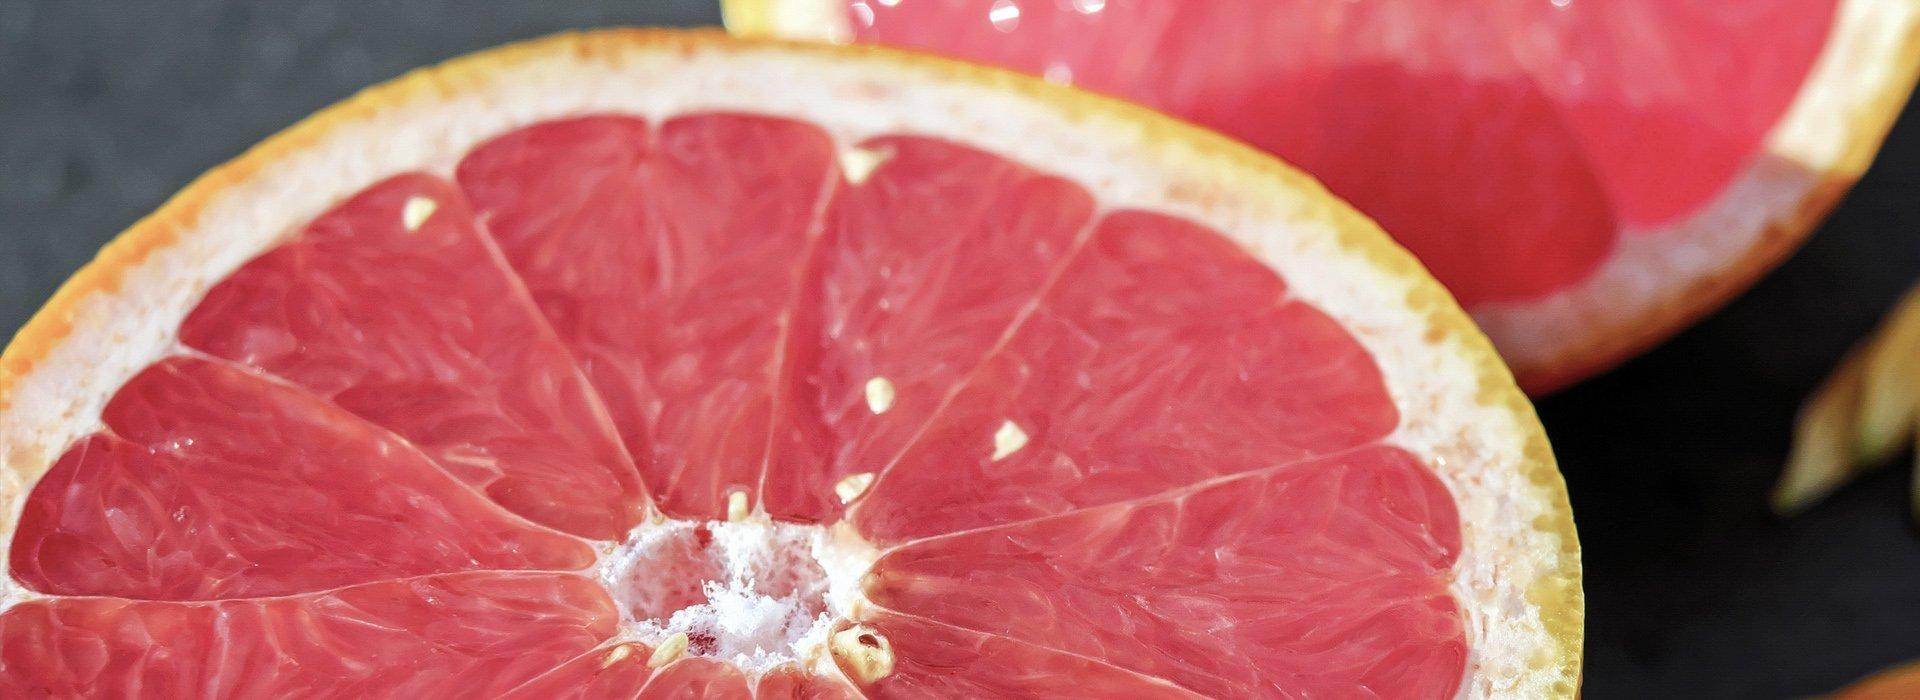 Photo of a pink grapefruit